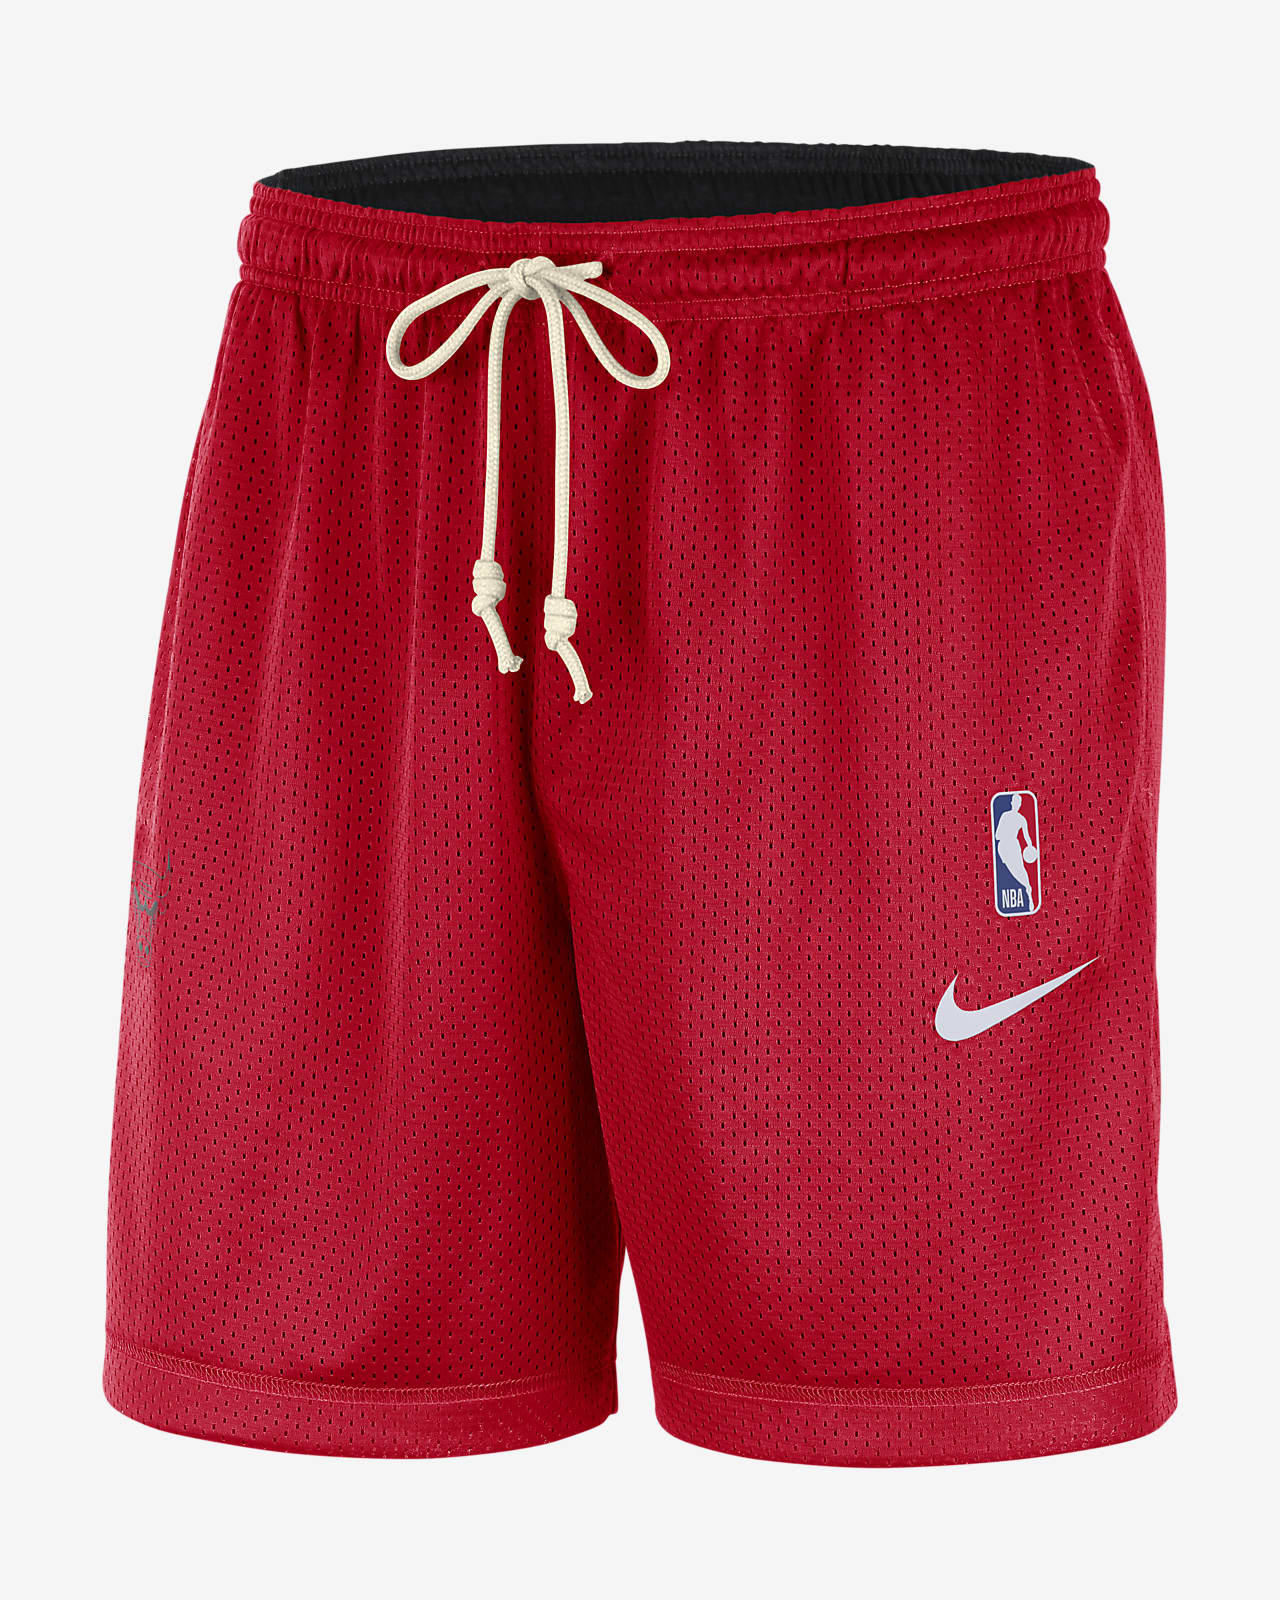 Bulls Standard Issue Men's Nike NBA Reversible Shorts